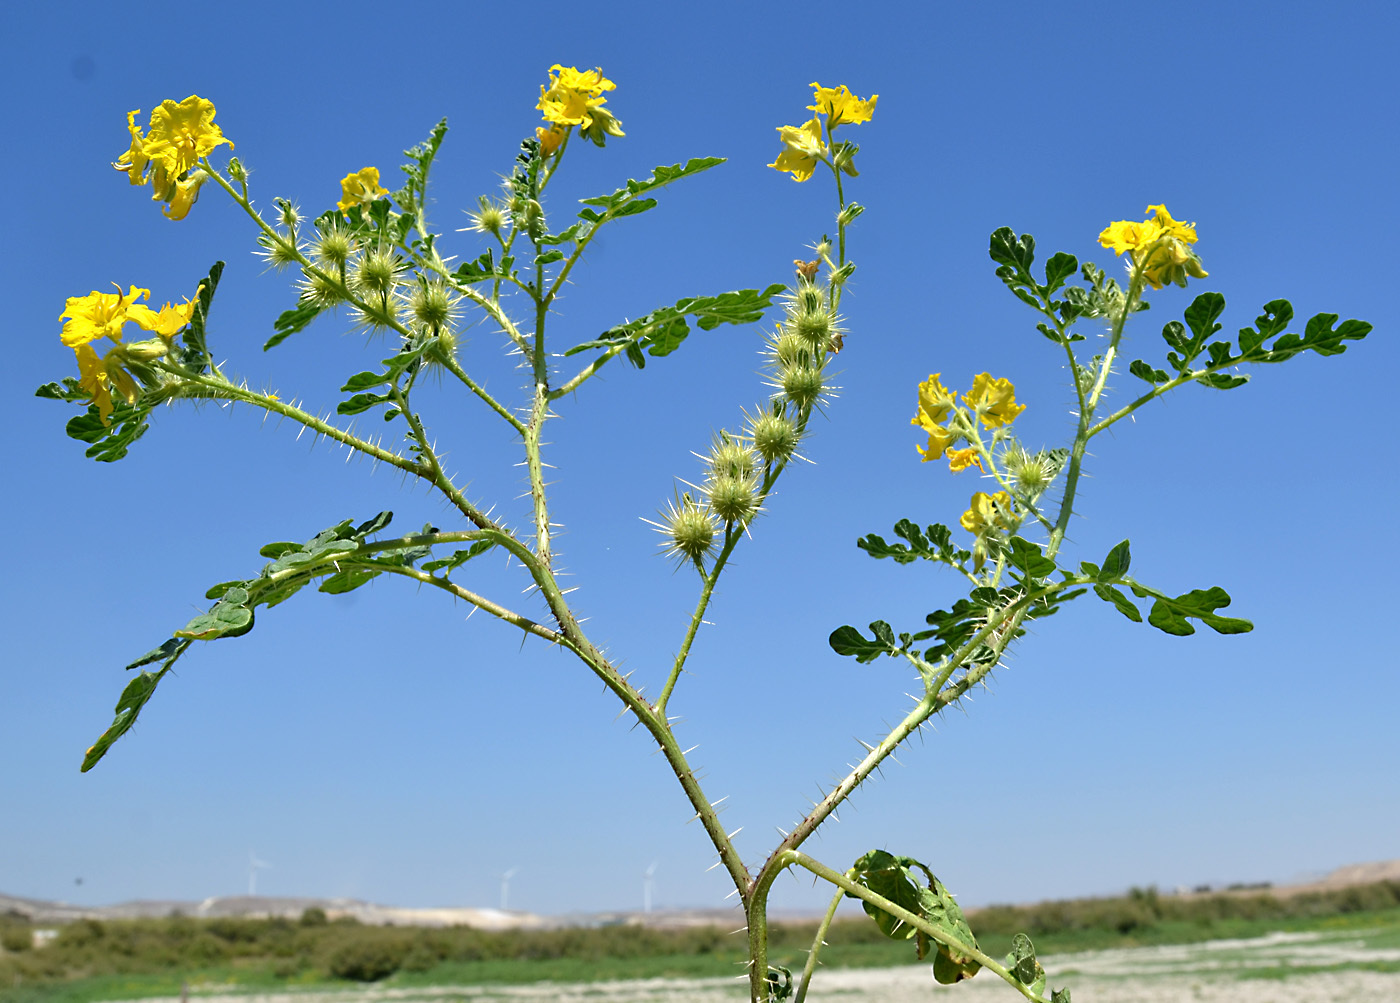 https://pictures.bgbm.org/digilib/Scaler?fn=Cyprus/Solanum_cornutum_A2.jpg&mo=file